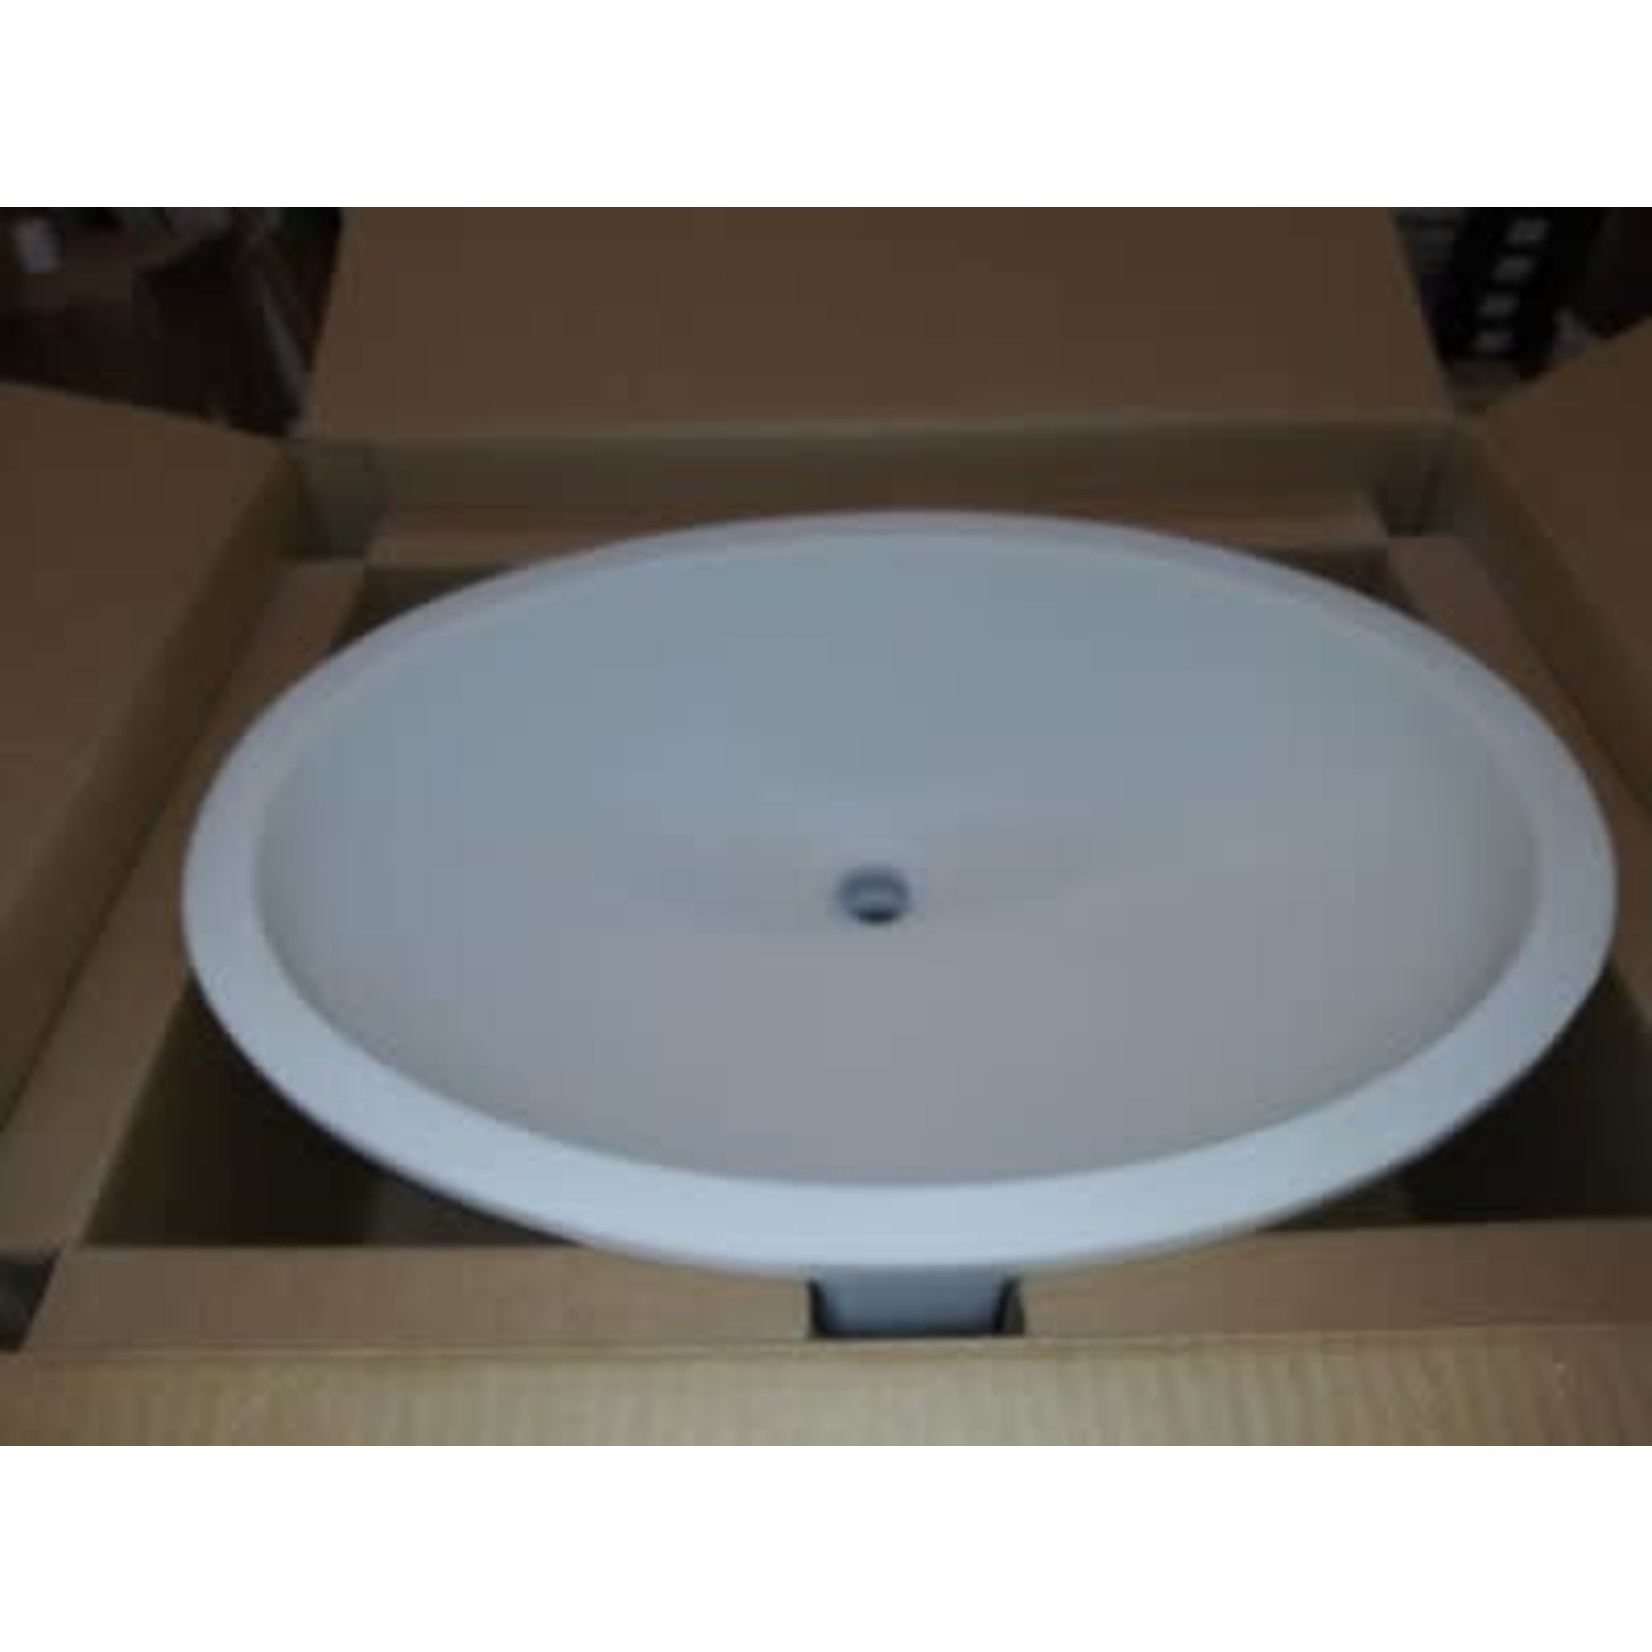 2814 Wilsonart Calm White Large Oval Vanity Sink